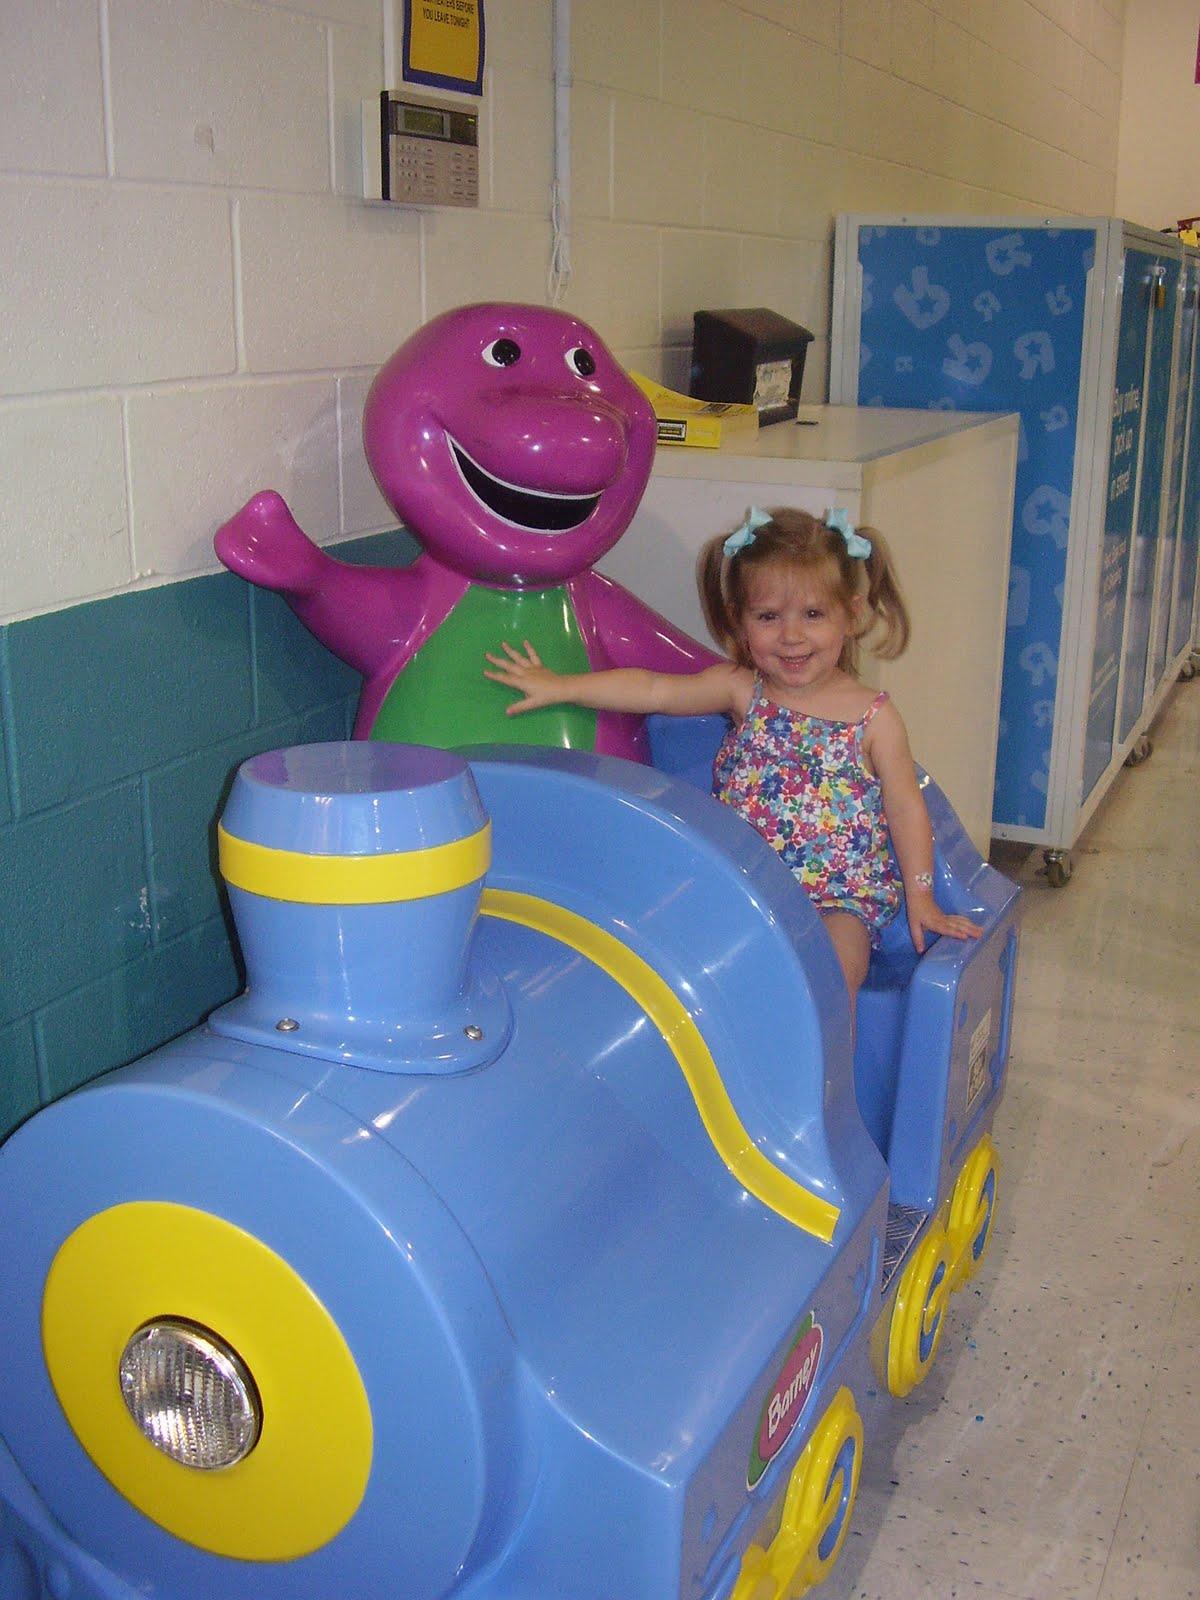 Toys R Us Ride : North family adventures gretchen s train ride